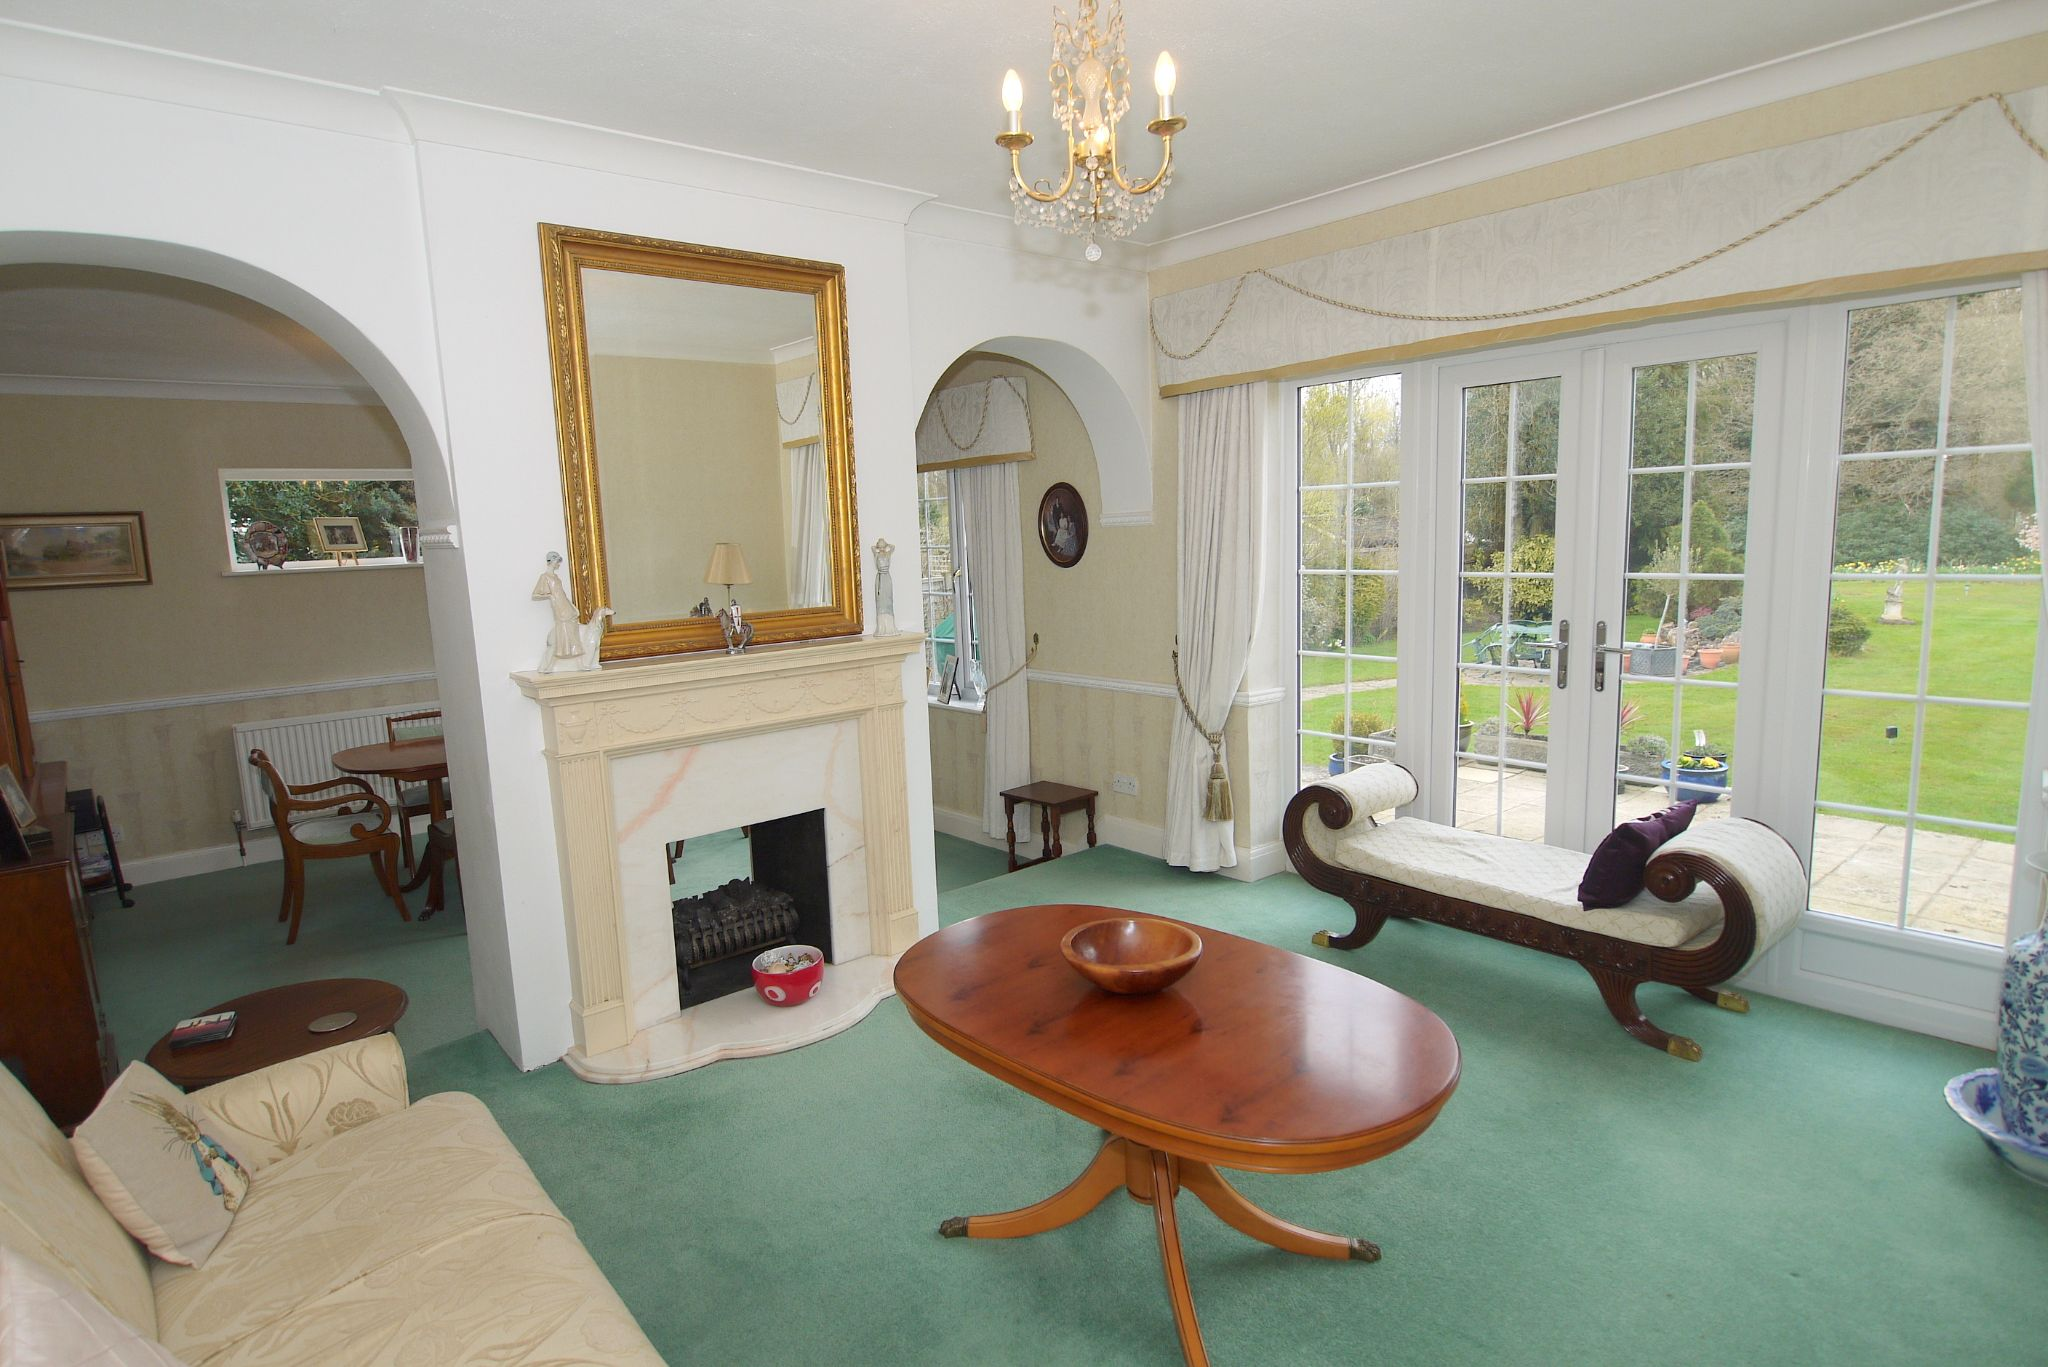 4 bedroom detached house Sold in Sevenoaks - Photograph 2